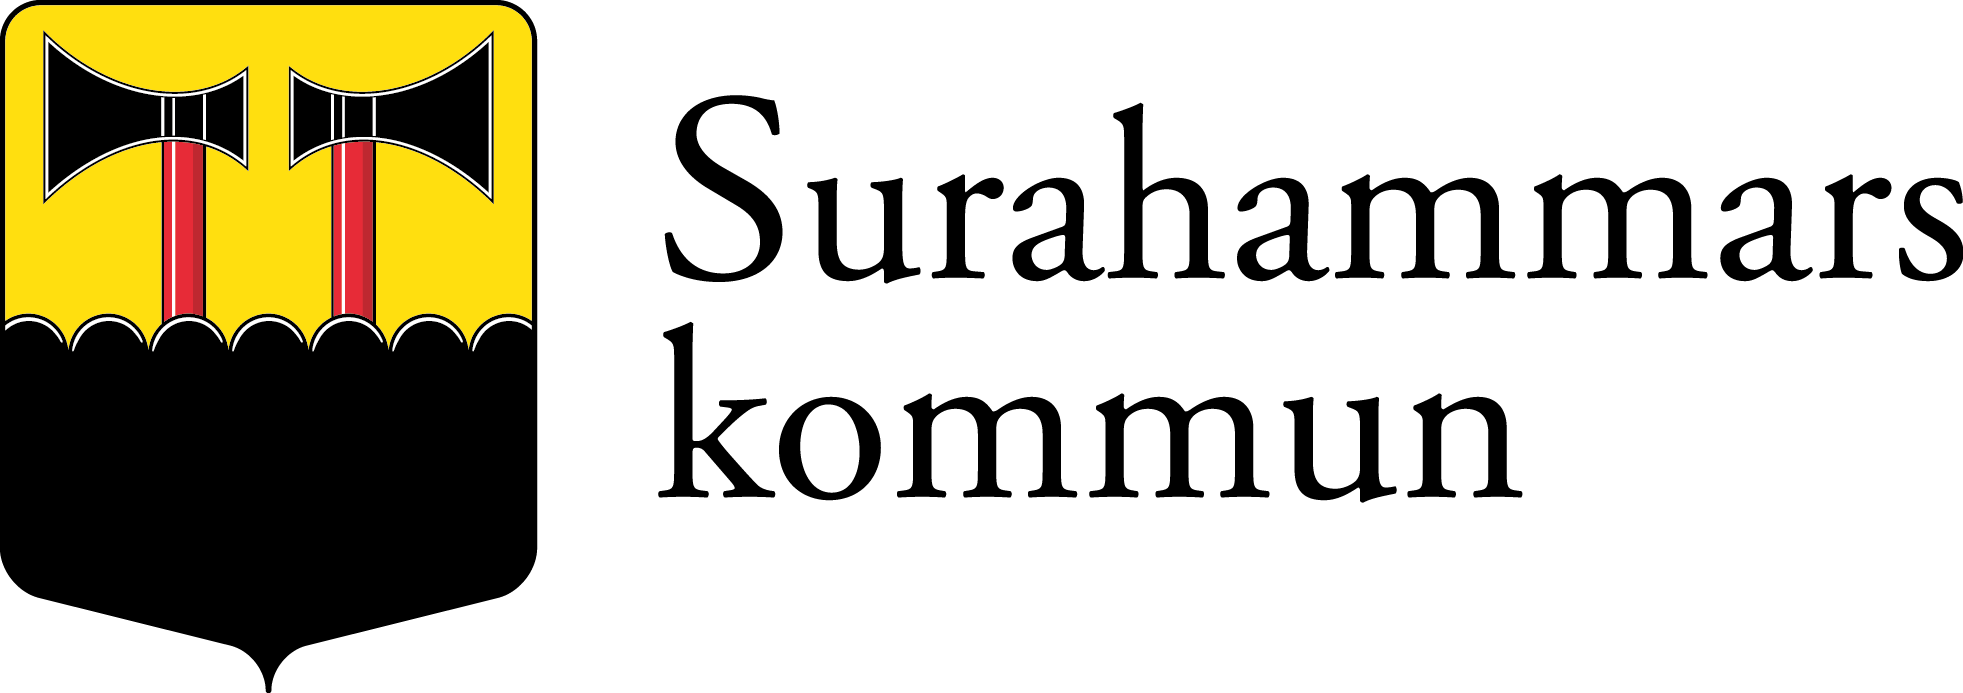 sura-logo.png